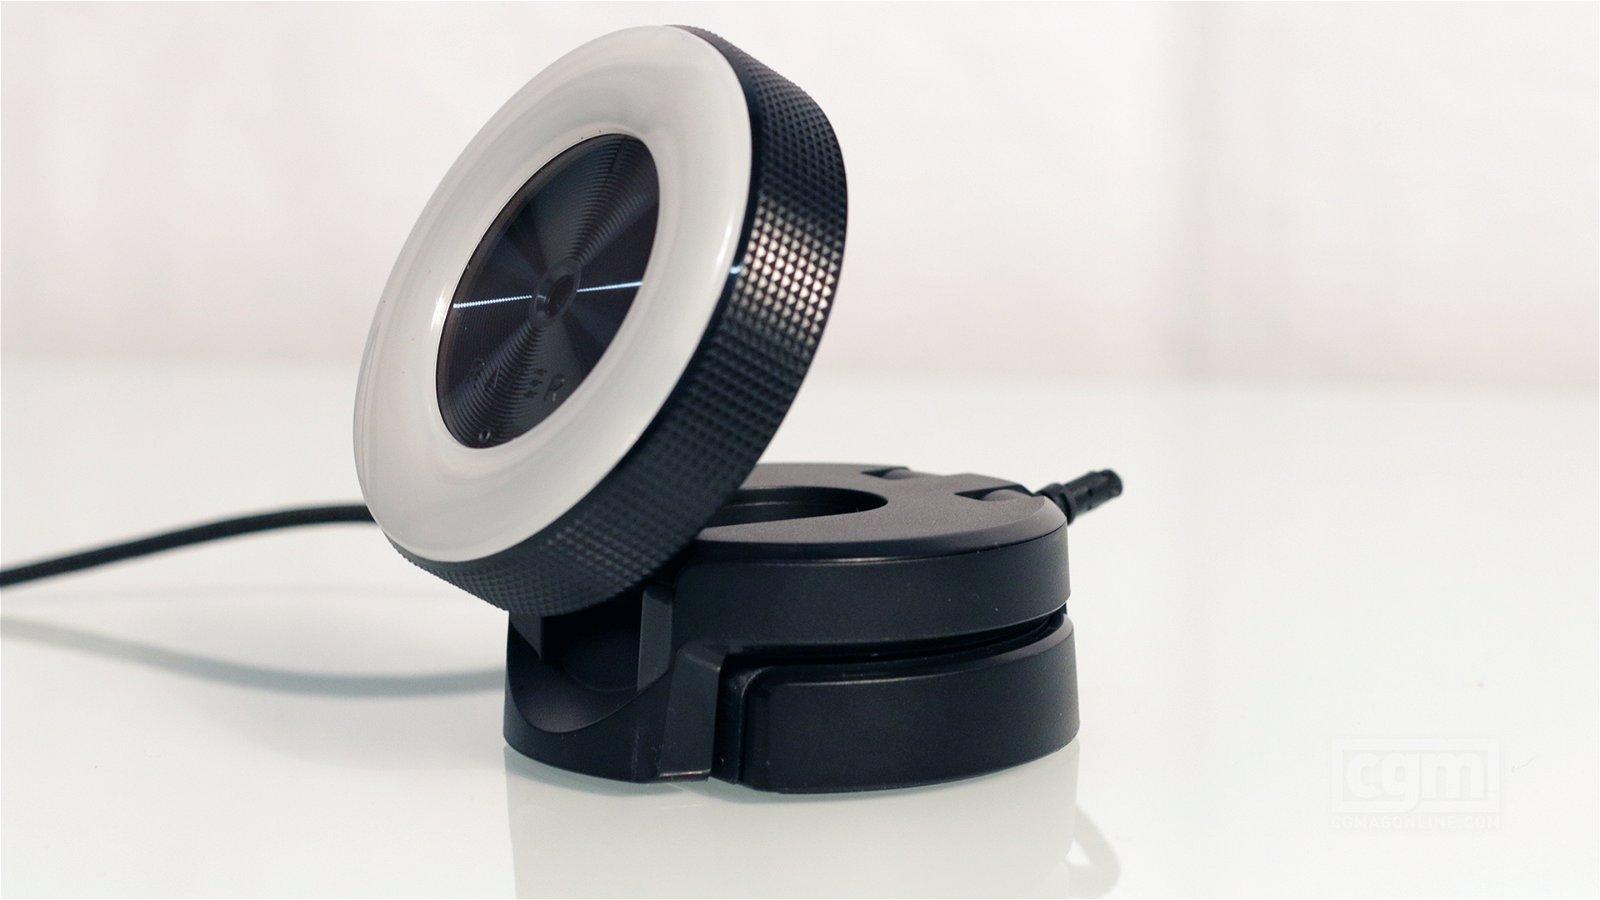 Razer Kiyo HD Webcam (Hardware) Review 5